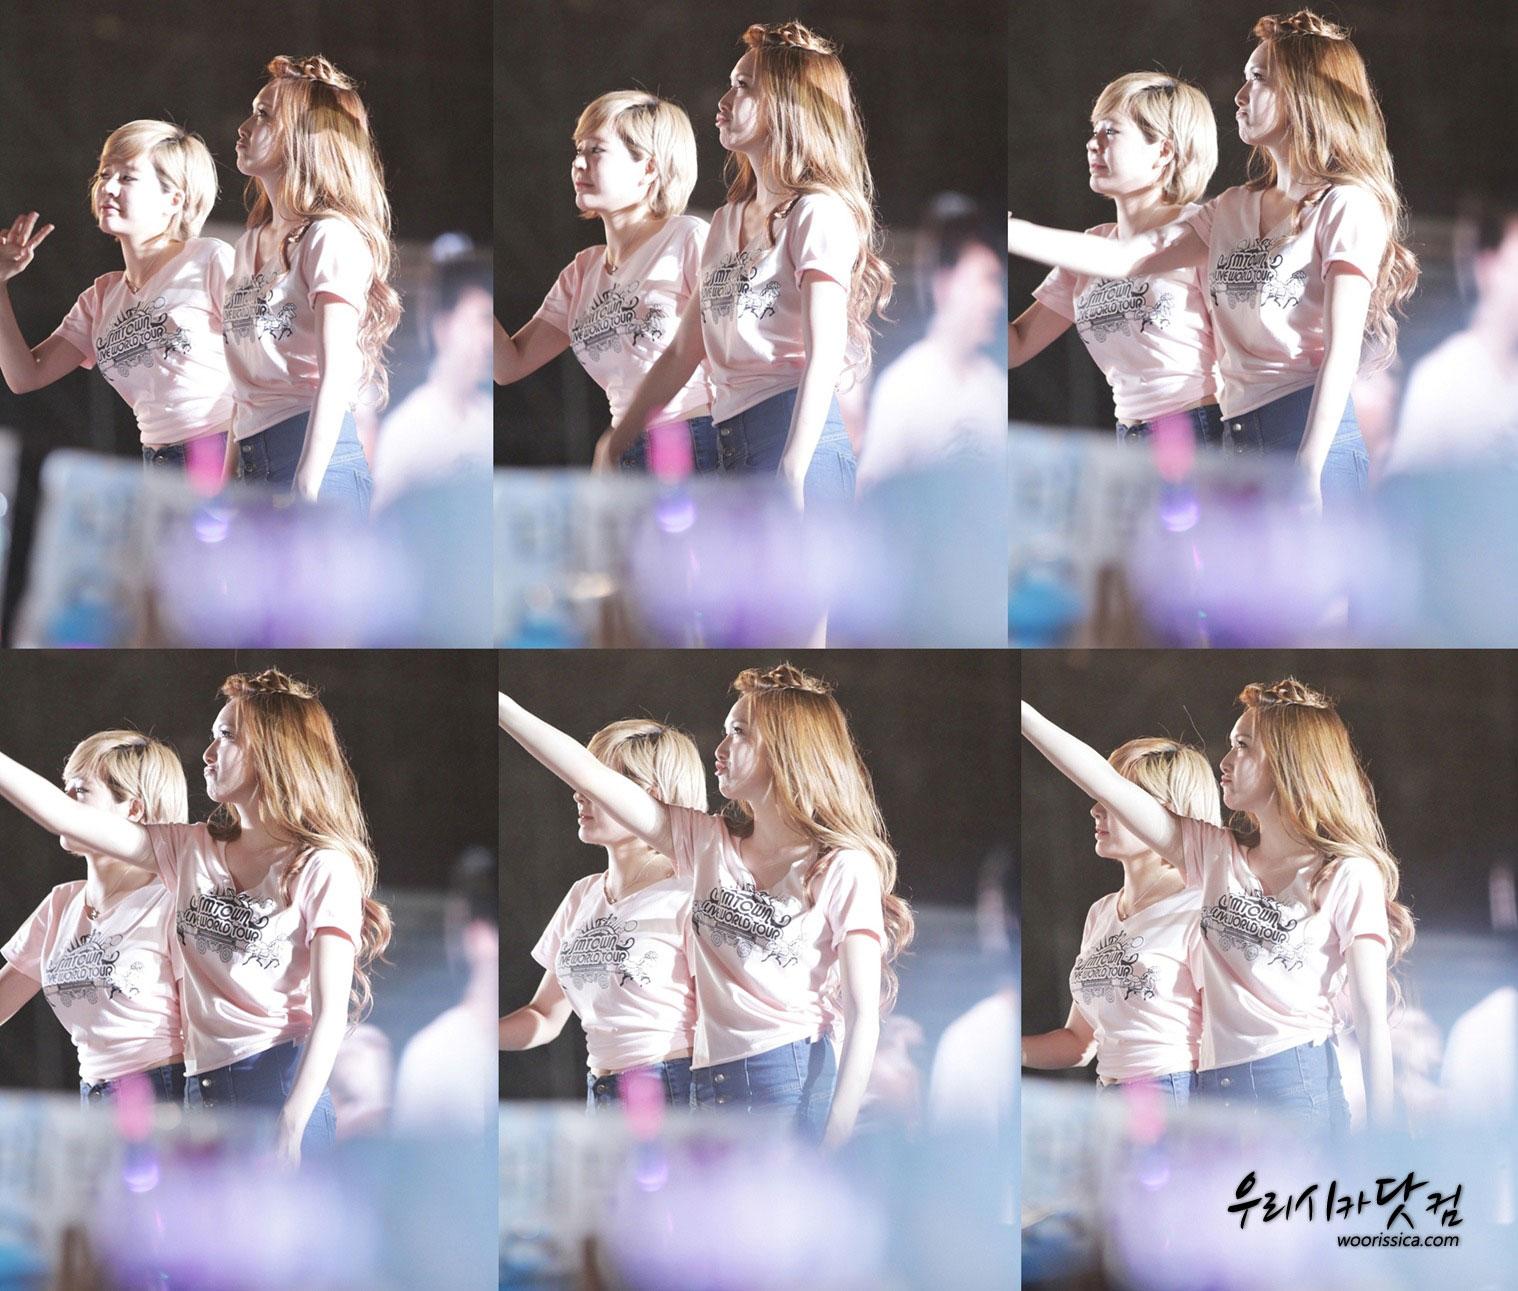 Jessica focus @ SMTown Taiwan Tour 2012 Smtown-taiwan-jessica-10